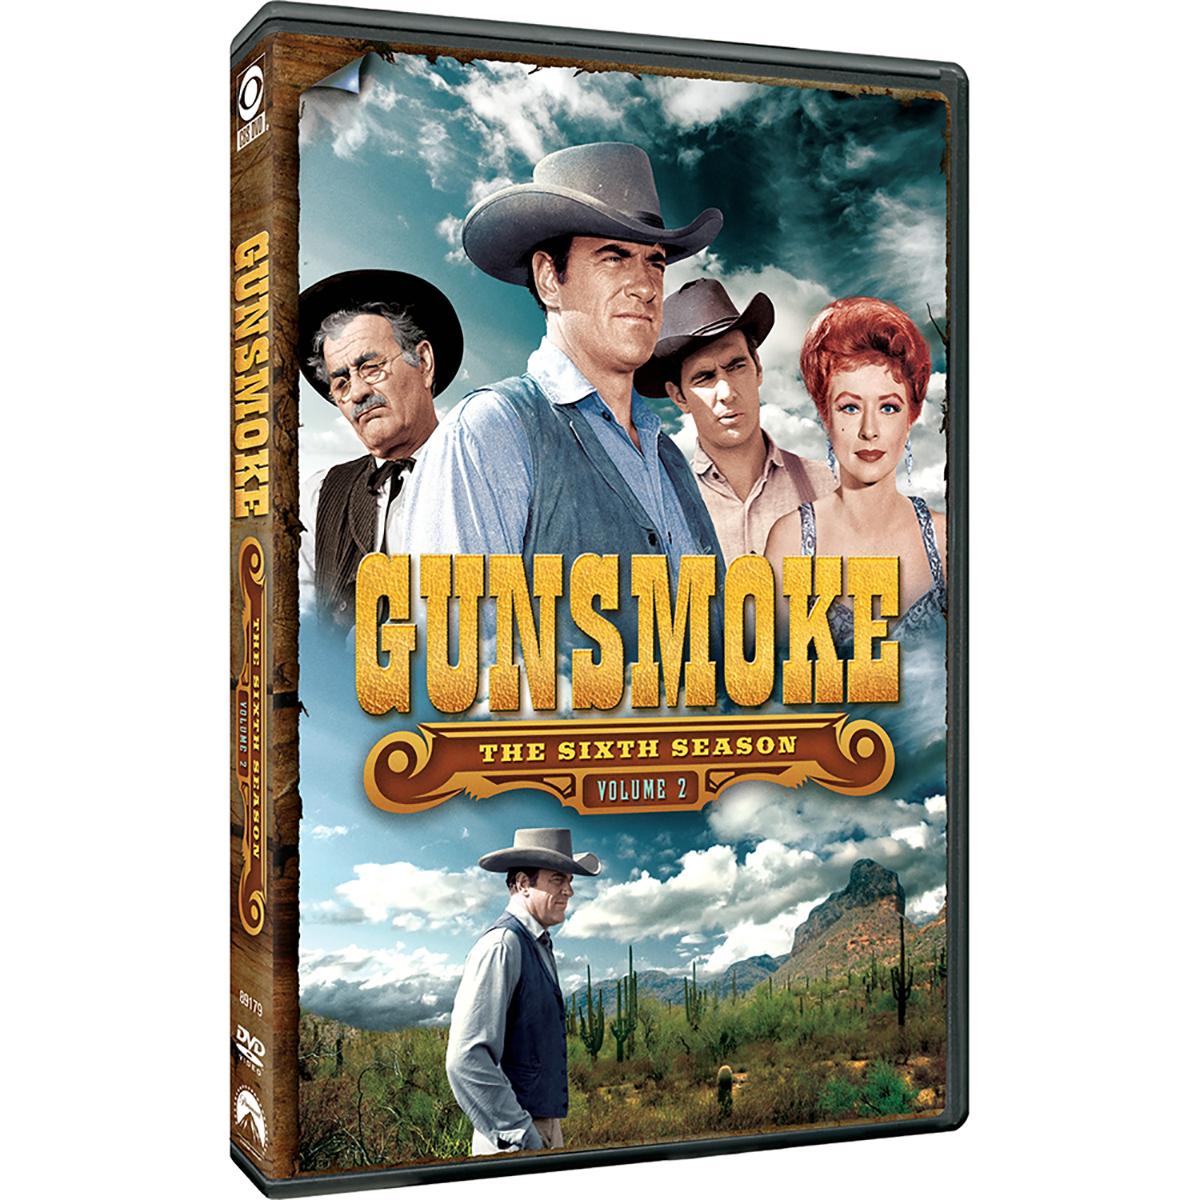 Gunsmoke: Season 6 - Volume 2 DVD -  DVDs & Videos 6445-380671